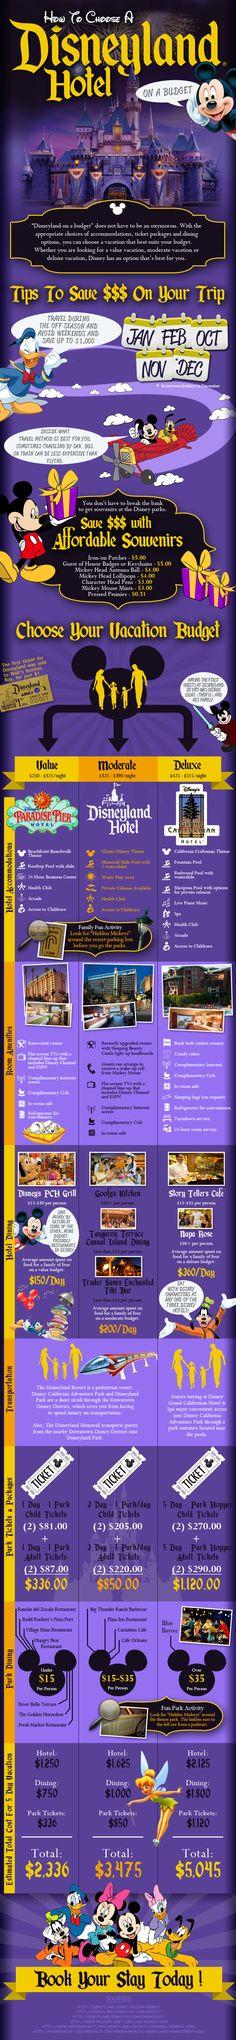 Choosing a Disneyland Hotel on a Budgget [Infographic] | Hotels US Travel | Hotels.com